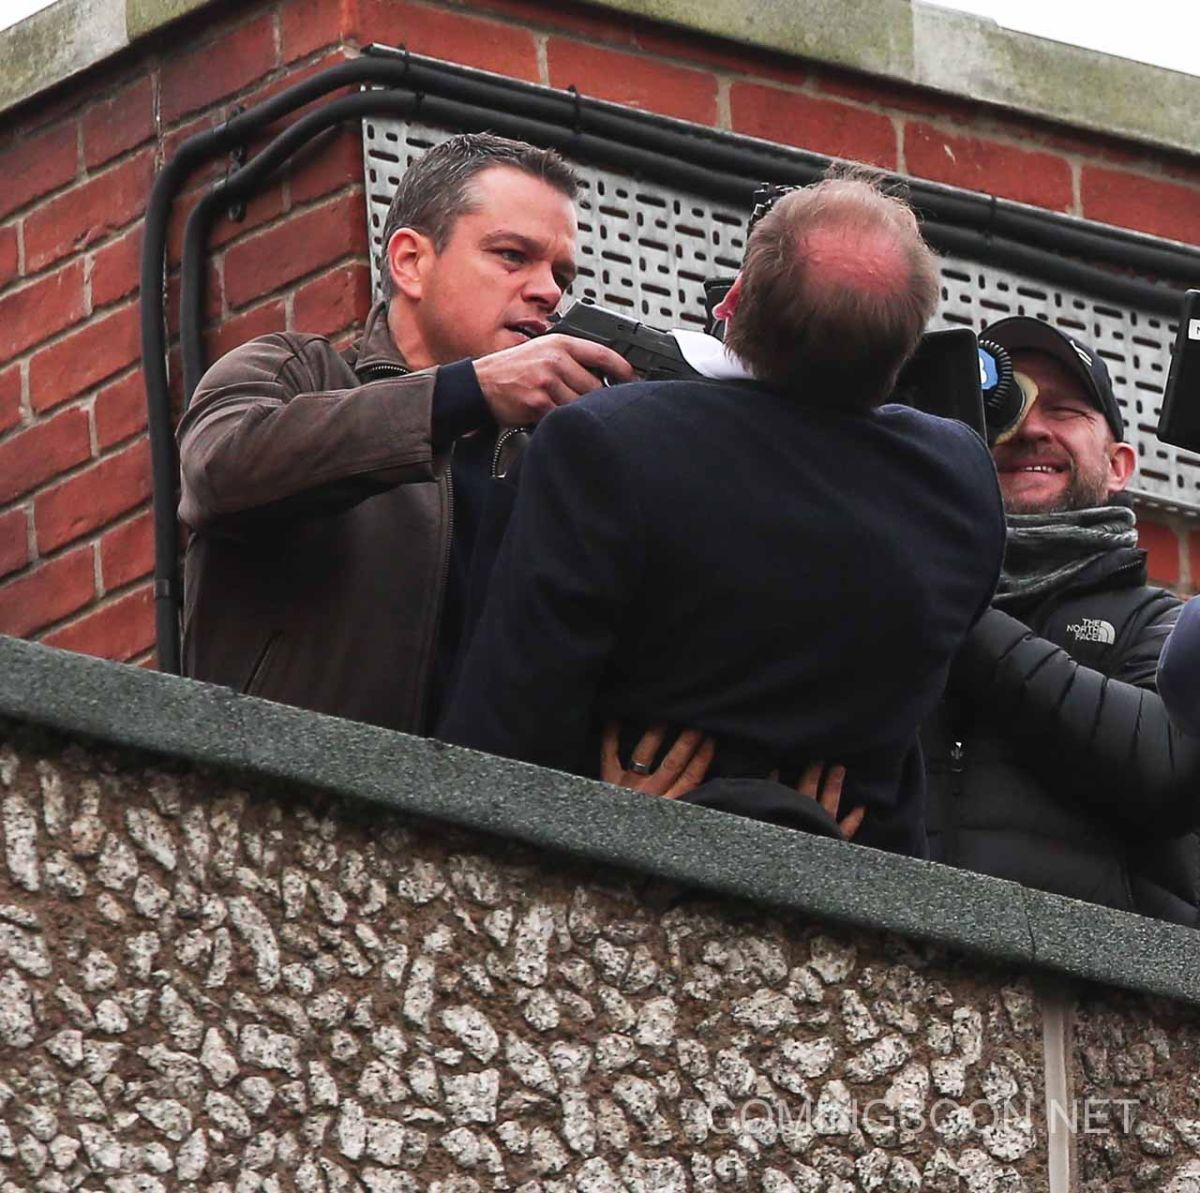 New set photos from Bourne 5 show Matt Damon in action